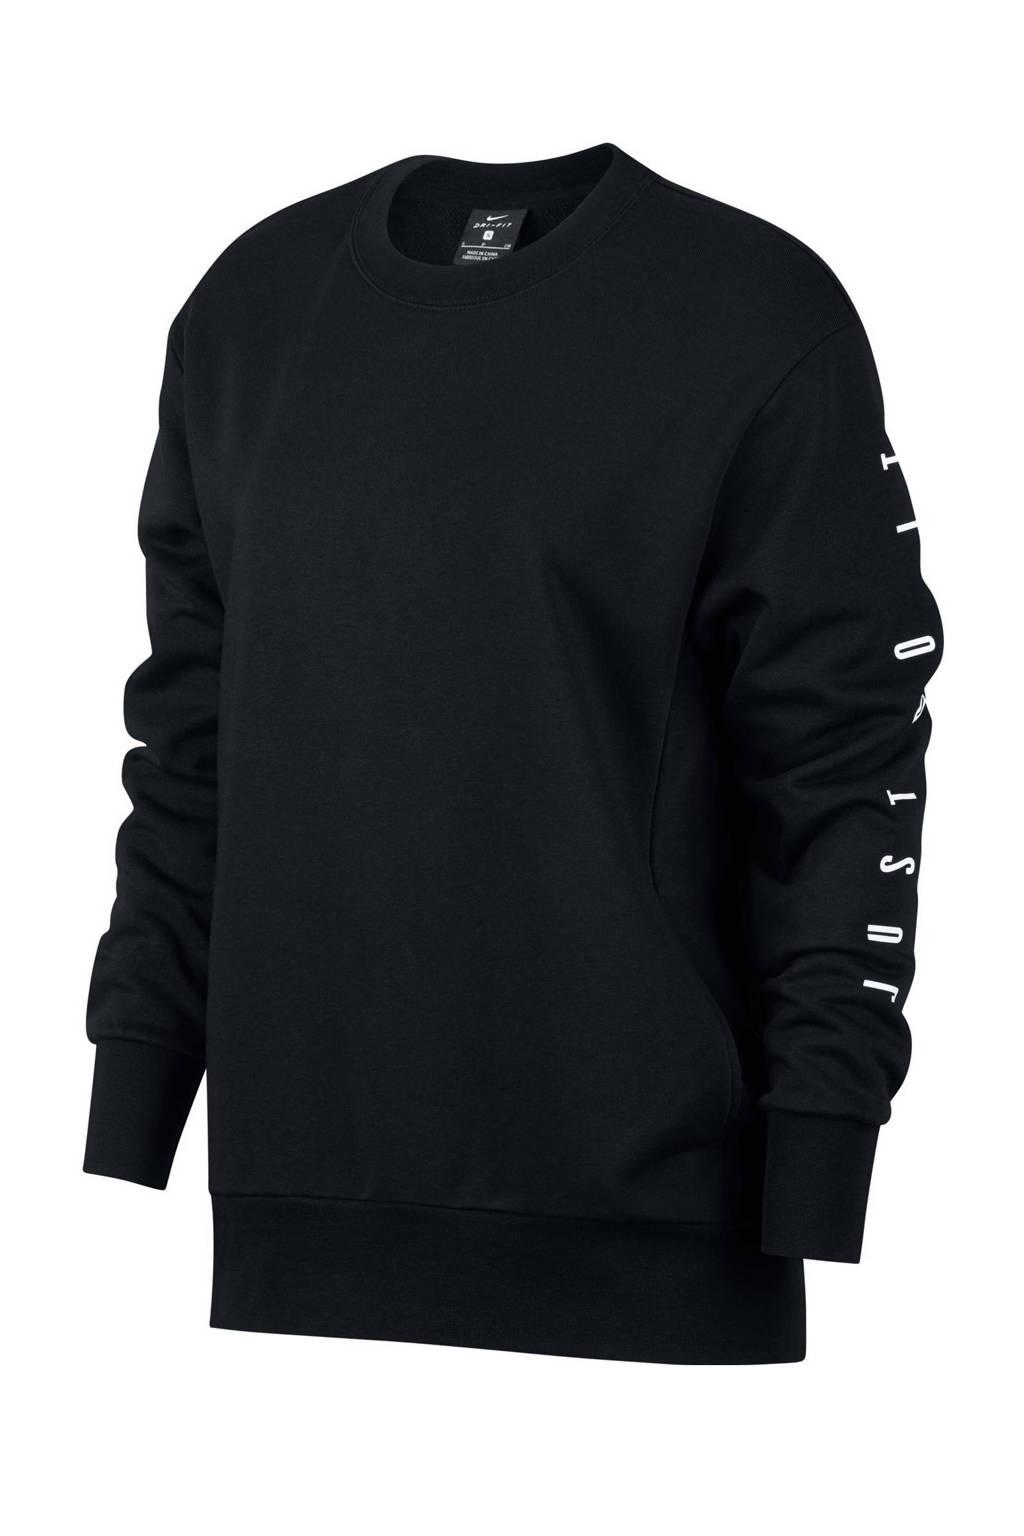 Nike sportsweater zwart, Zwart/wit